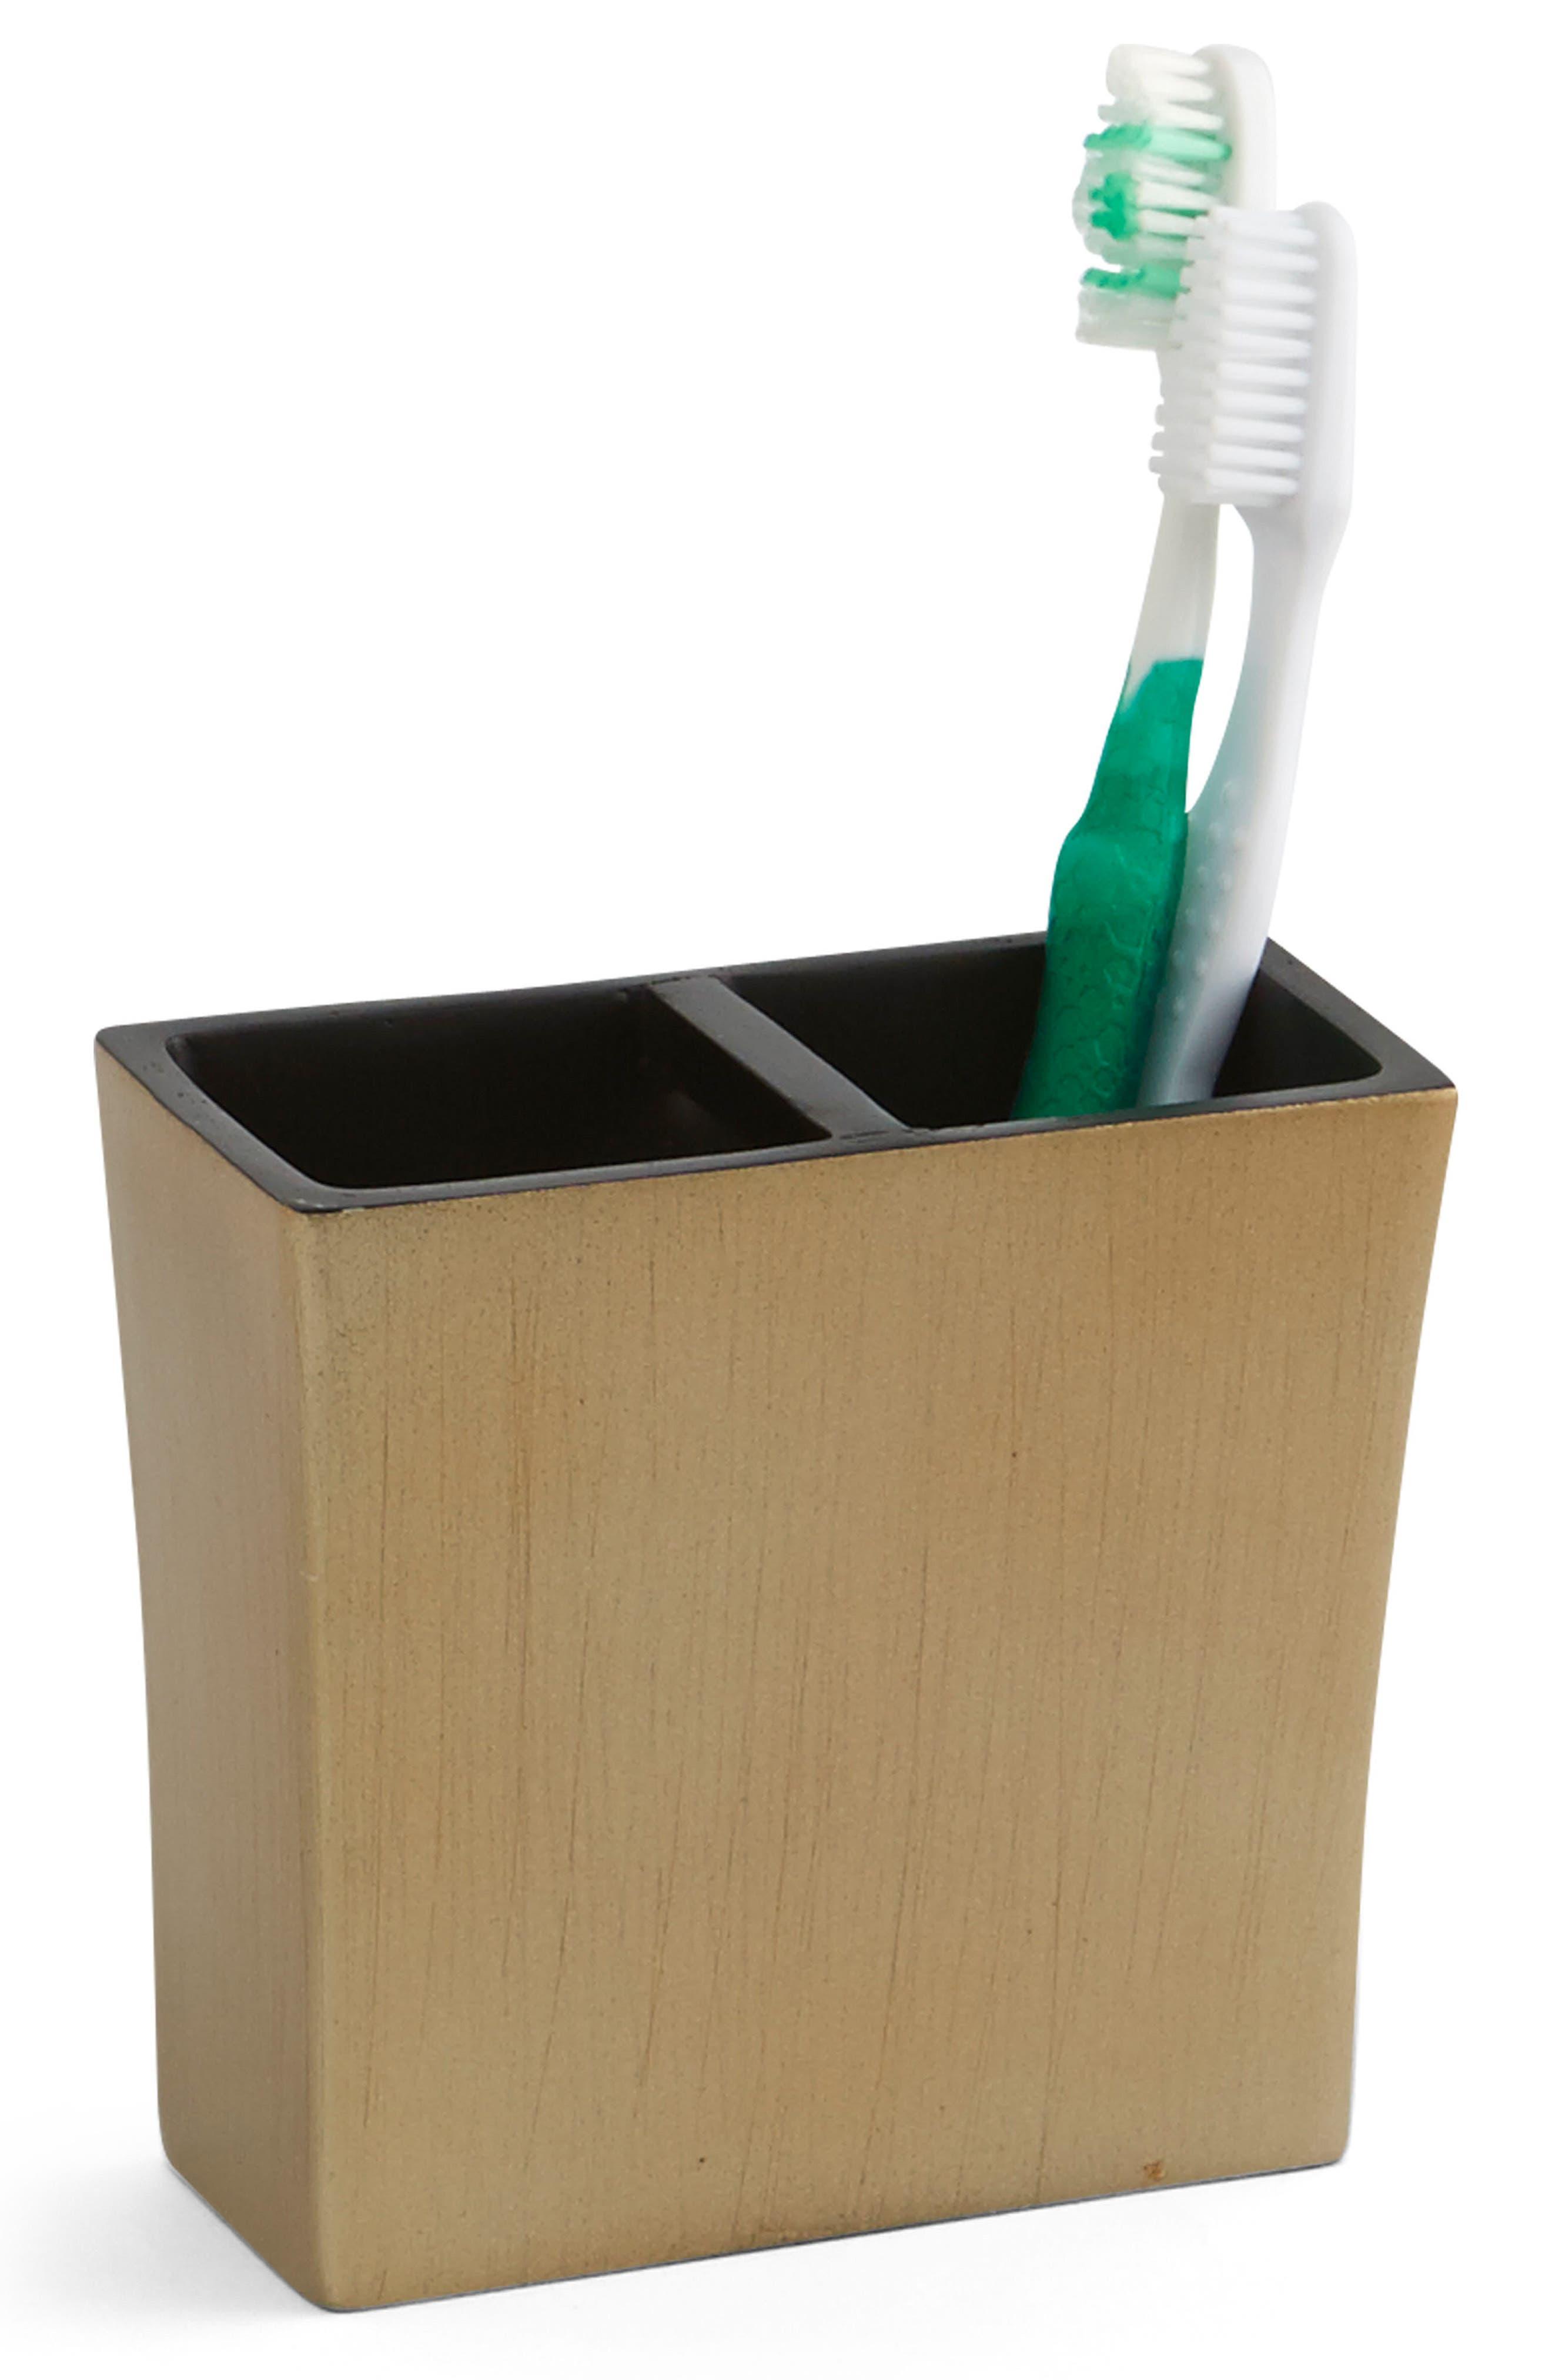 Main Image - Paradigm Trends Cooper Toothbrush Holder